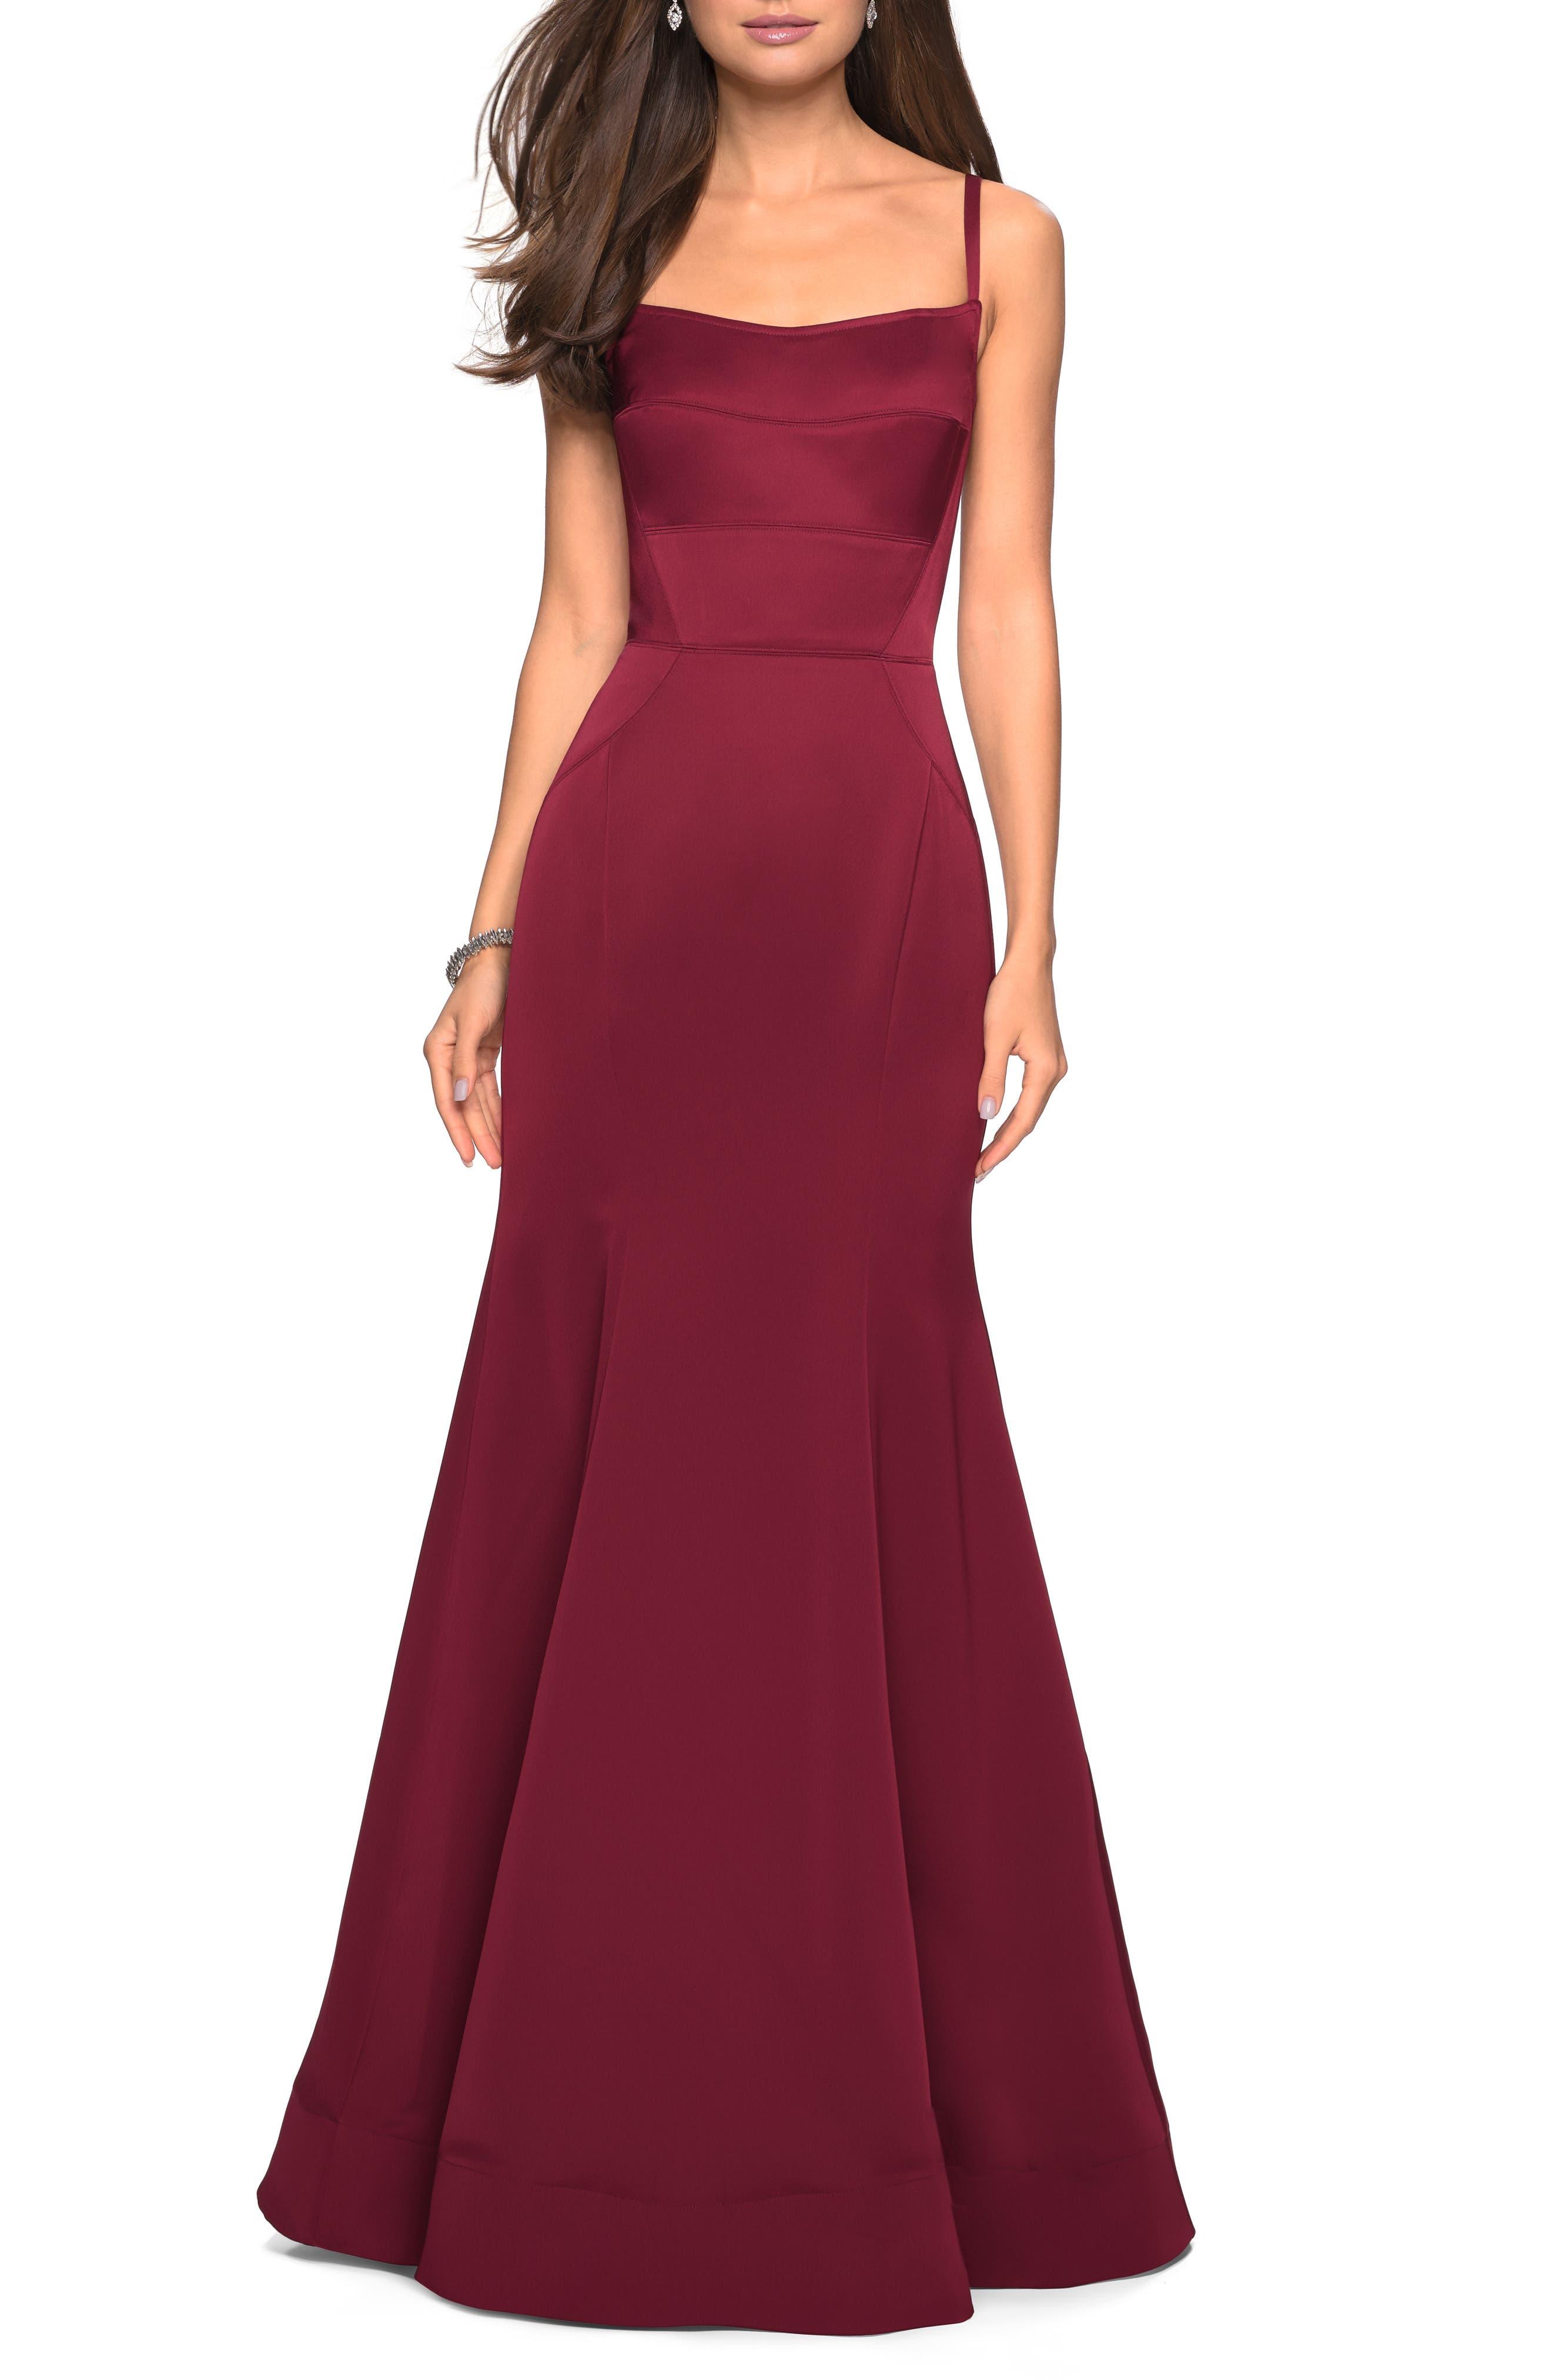 La Femme Structured Thick Jersey Trumpet Evening Dress